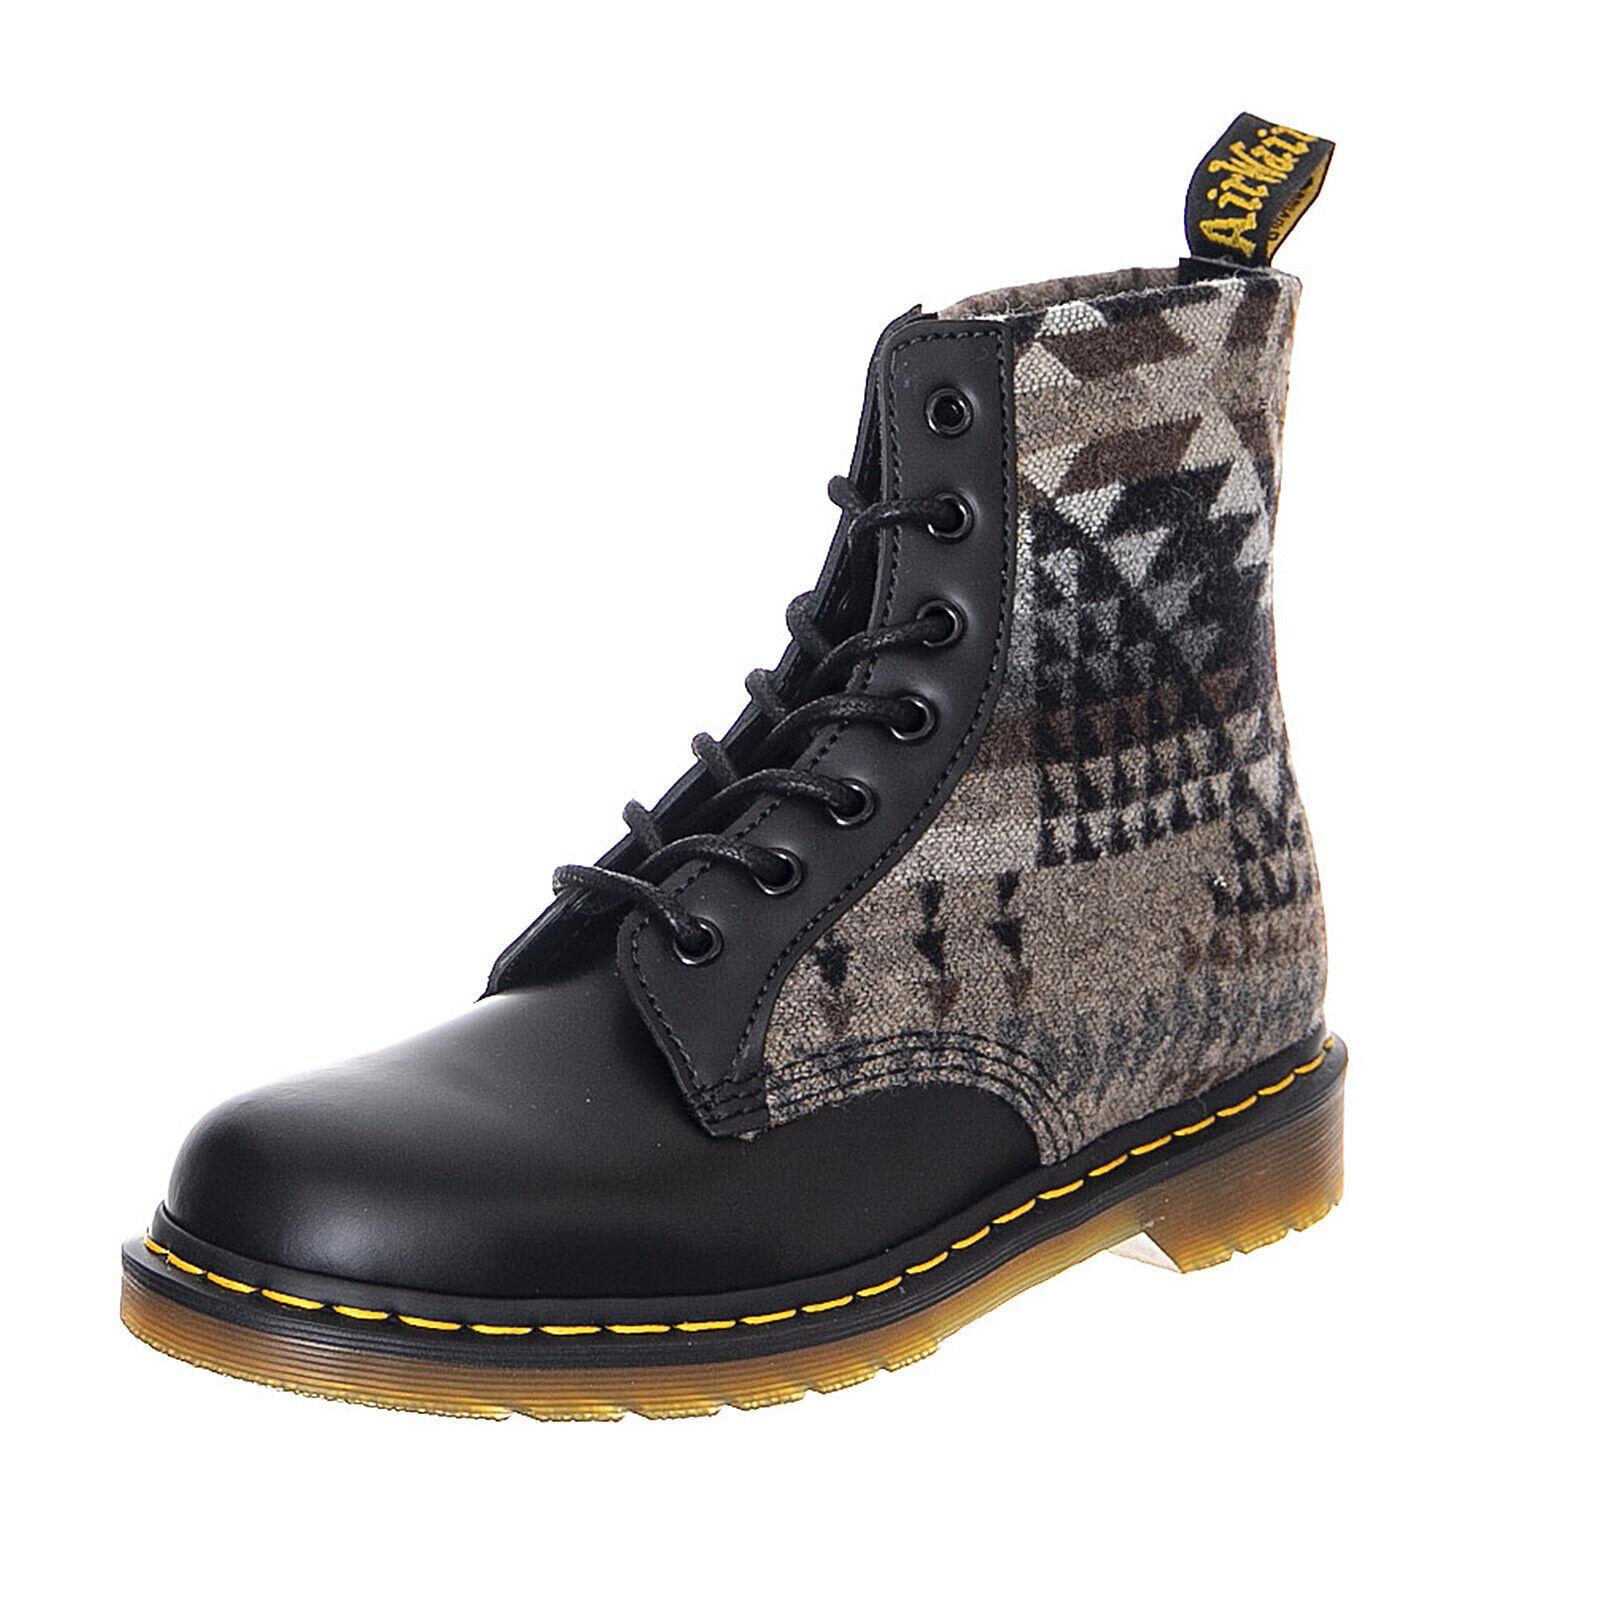 e22827d1c8 Dr.Martens X Pendleton Black Black Black Sooth Pagosa Springs - Combat  boots Men s Black ...